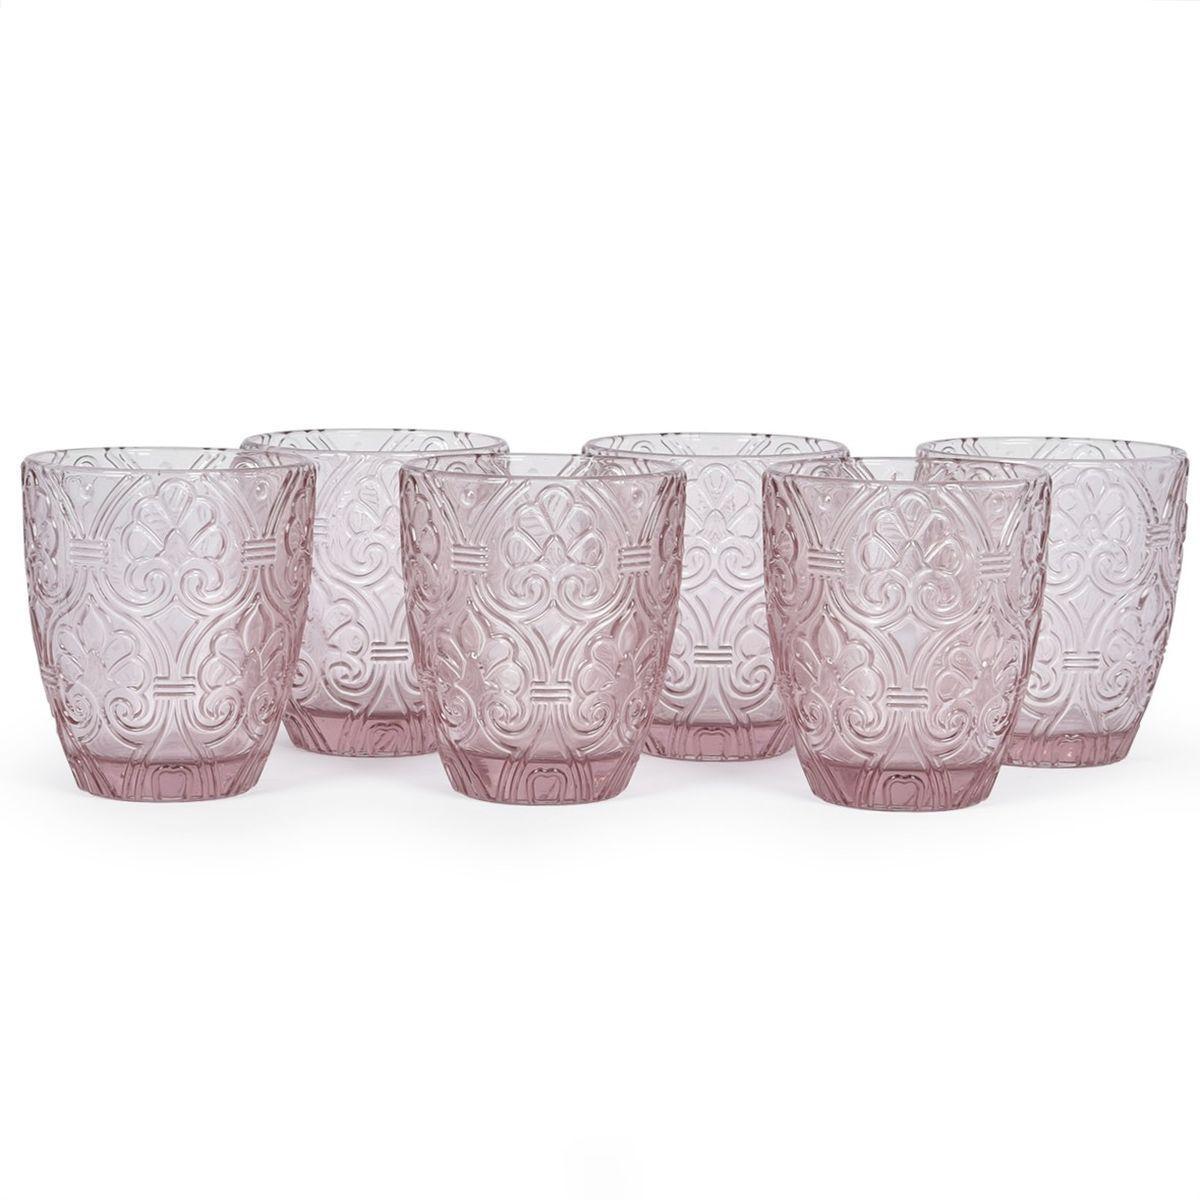 Набор из 6-ти стаканов из стекла розового цвета Corinto